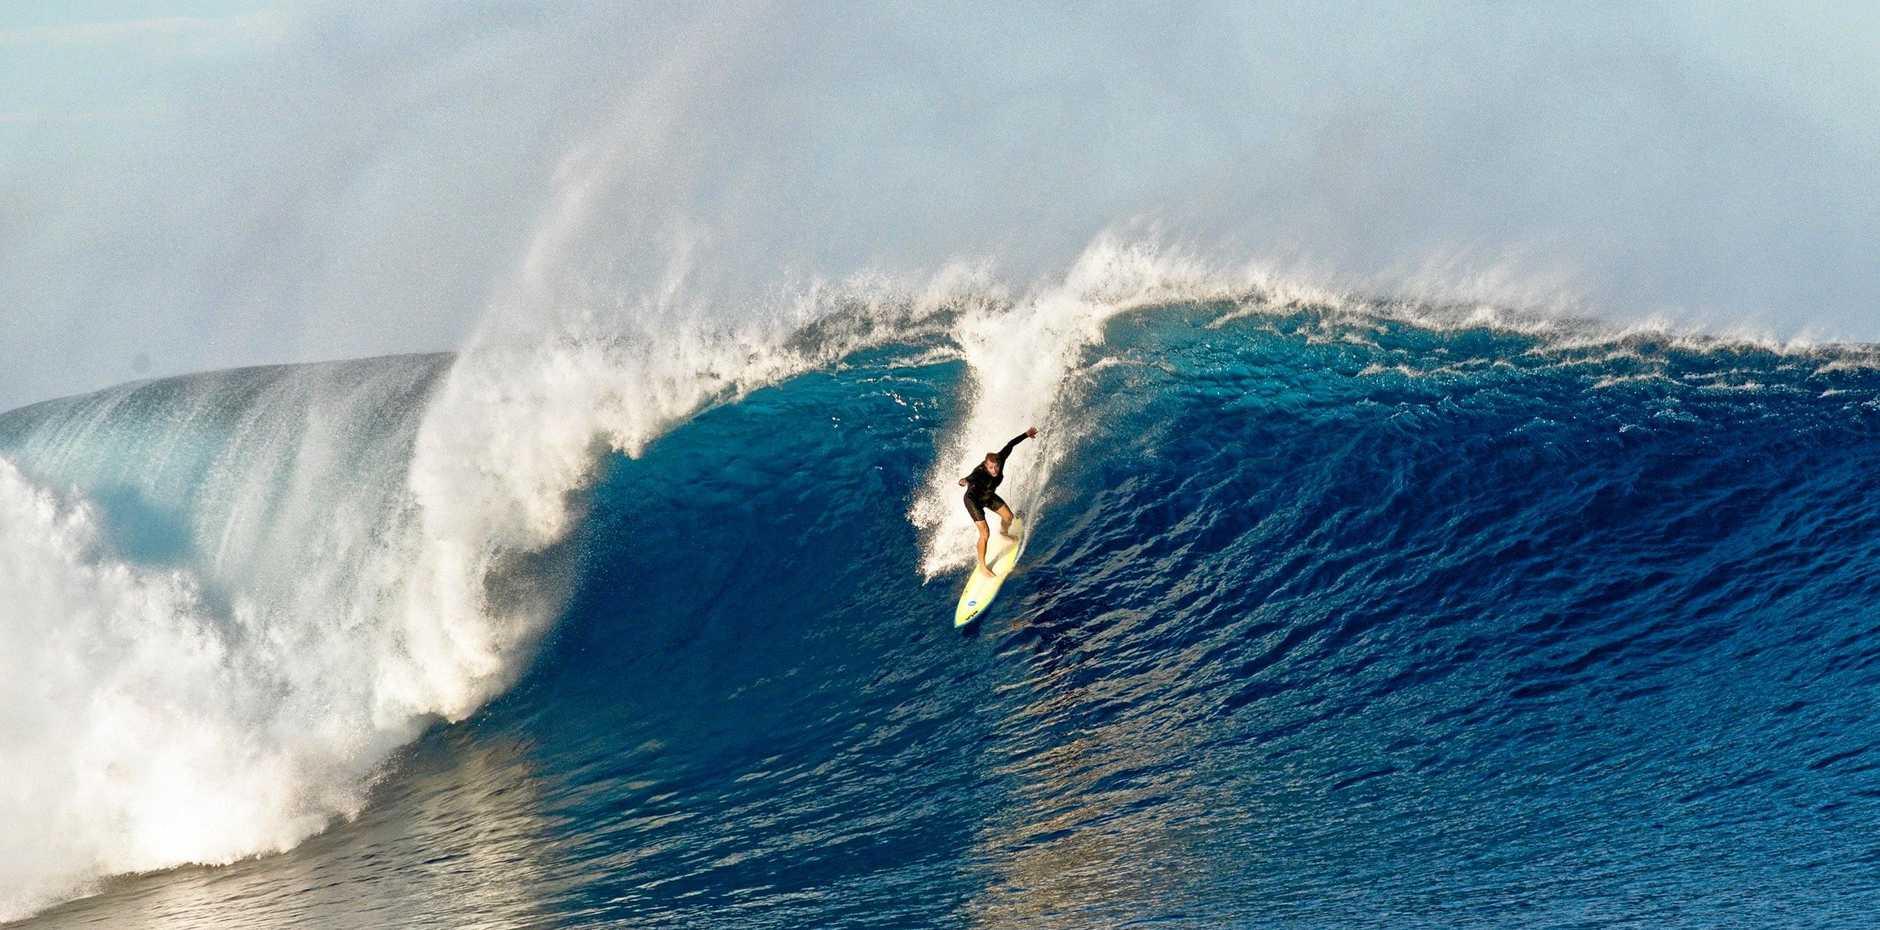 SUNSHINE Coast lifeguard supervisor (north) Anthony King drops into a Cloudbreak bomb off Tavarua Island in Fiji